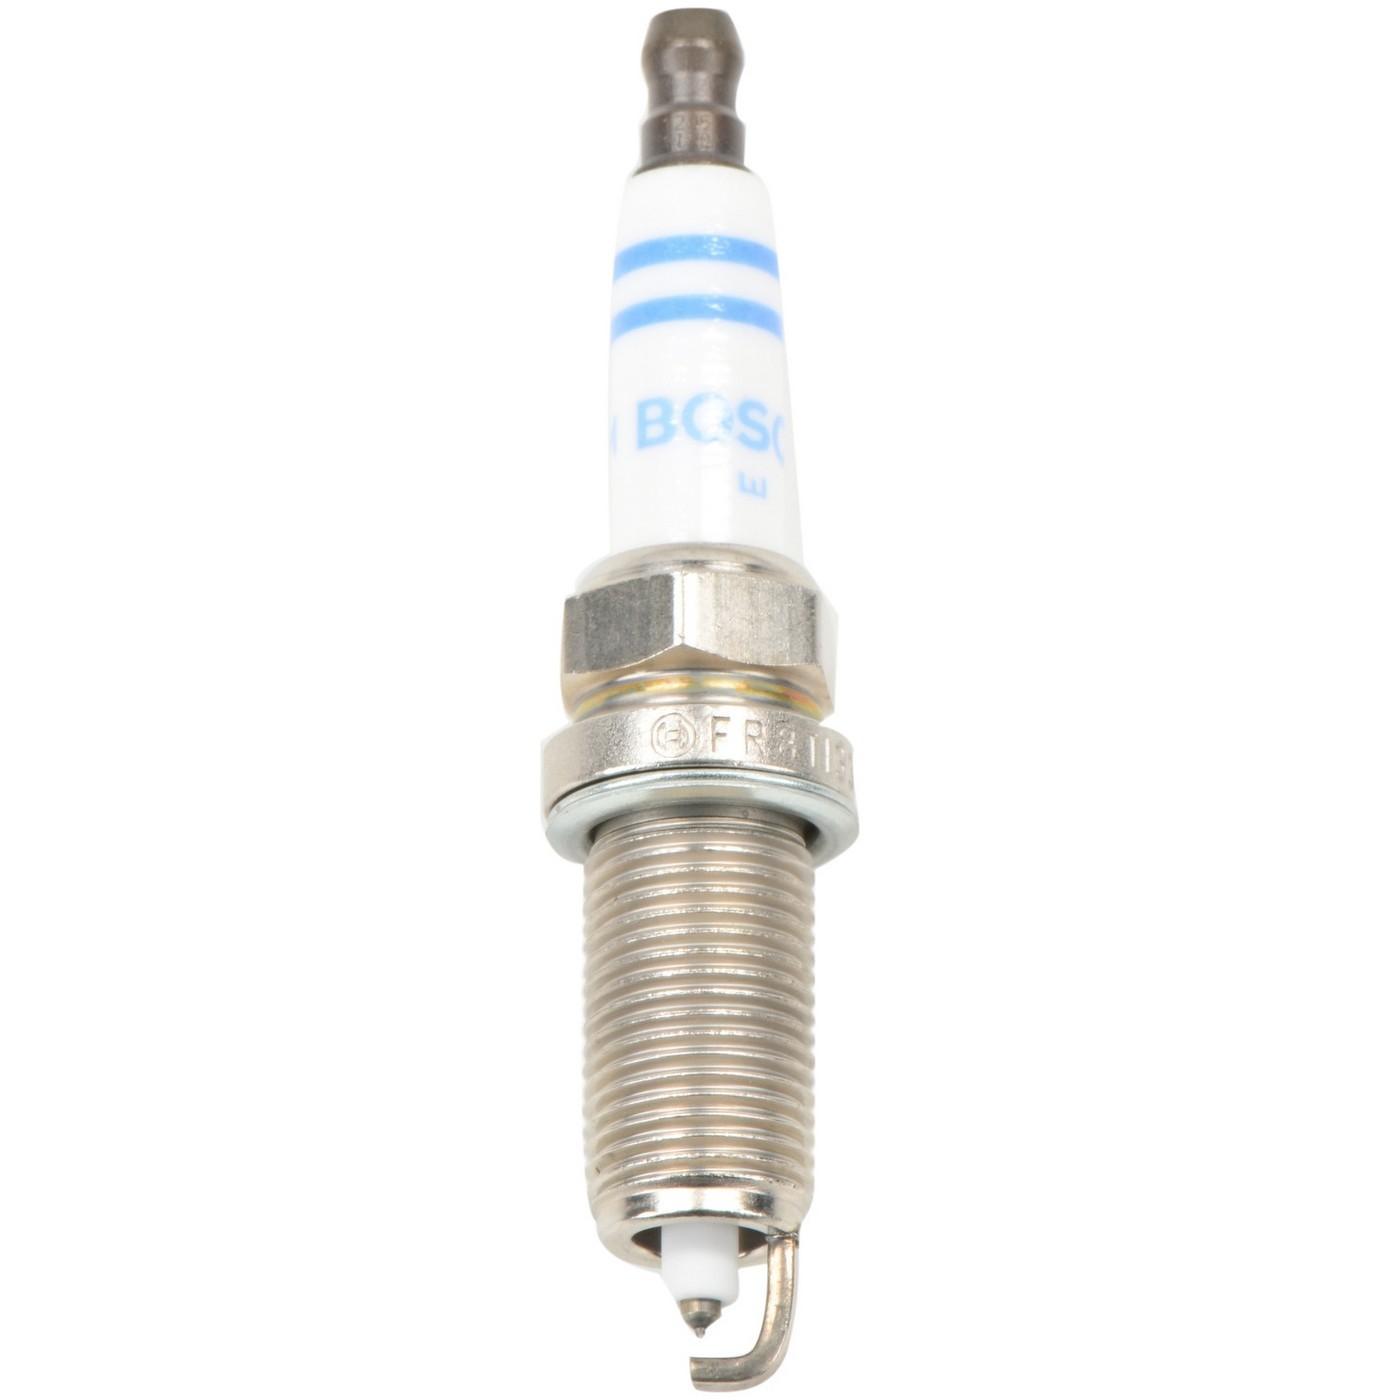 Iridium Spark Plugs Bosch Auto Parts Dodge Ram 1500 Plug Gap